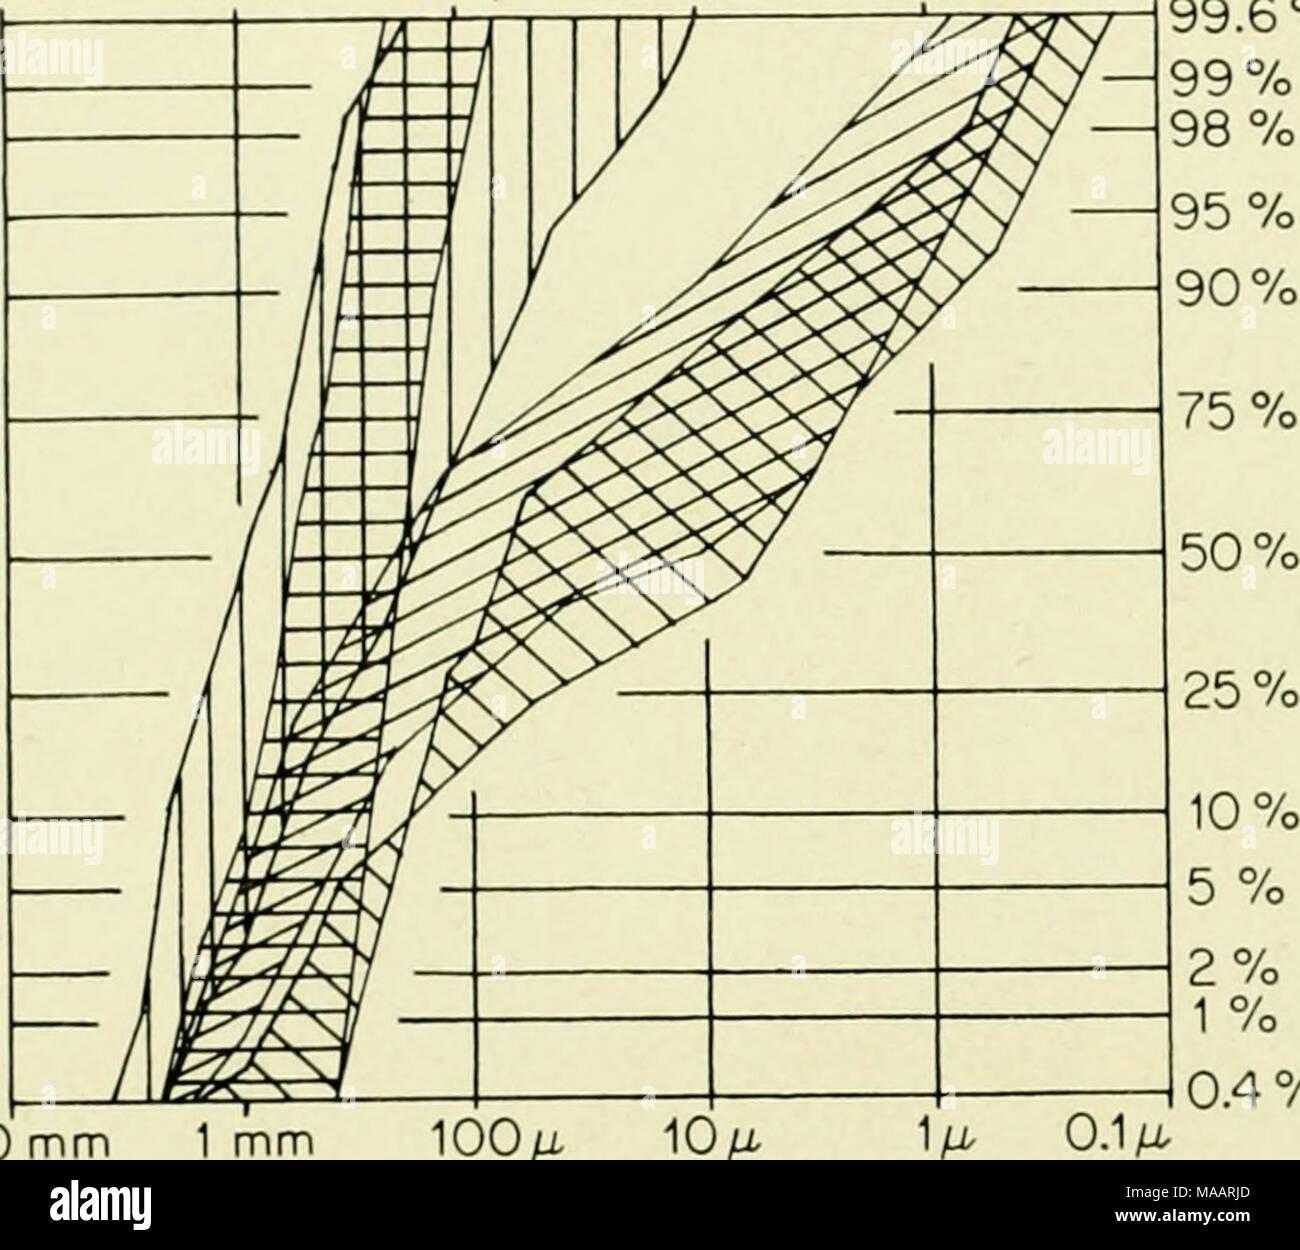 Magnificent Loi Proben Pattern - FORTSETZUNG ARBEITSBLATT - tsuhaan.info